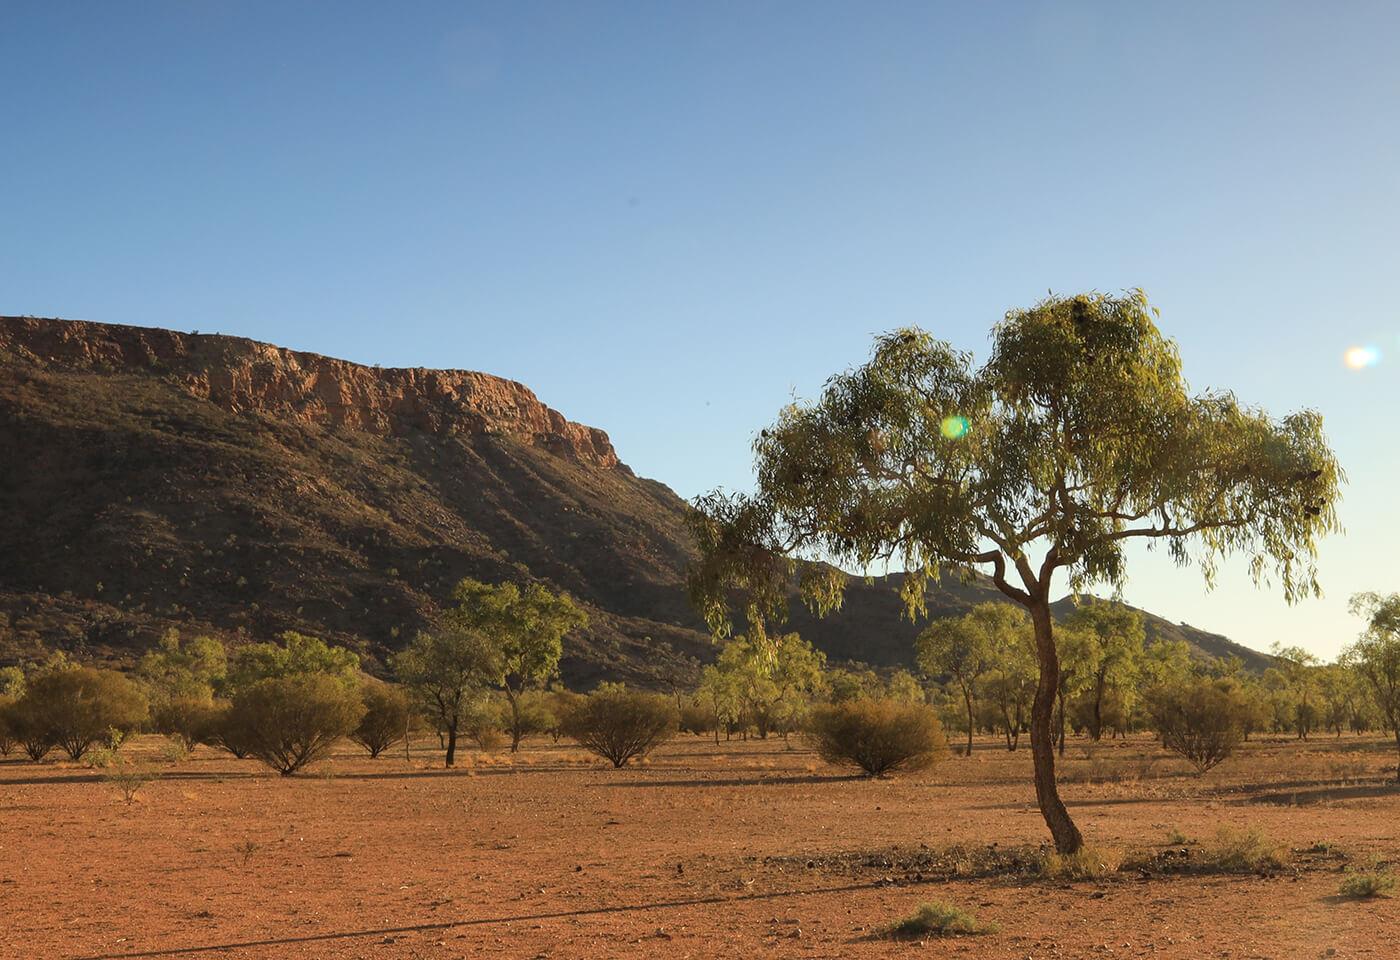 Sunset Photography at Desert Park by Steve Huddy